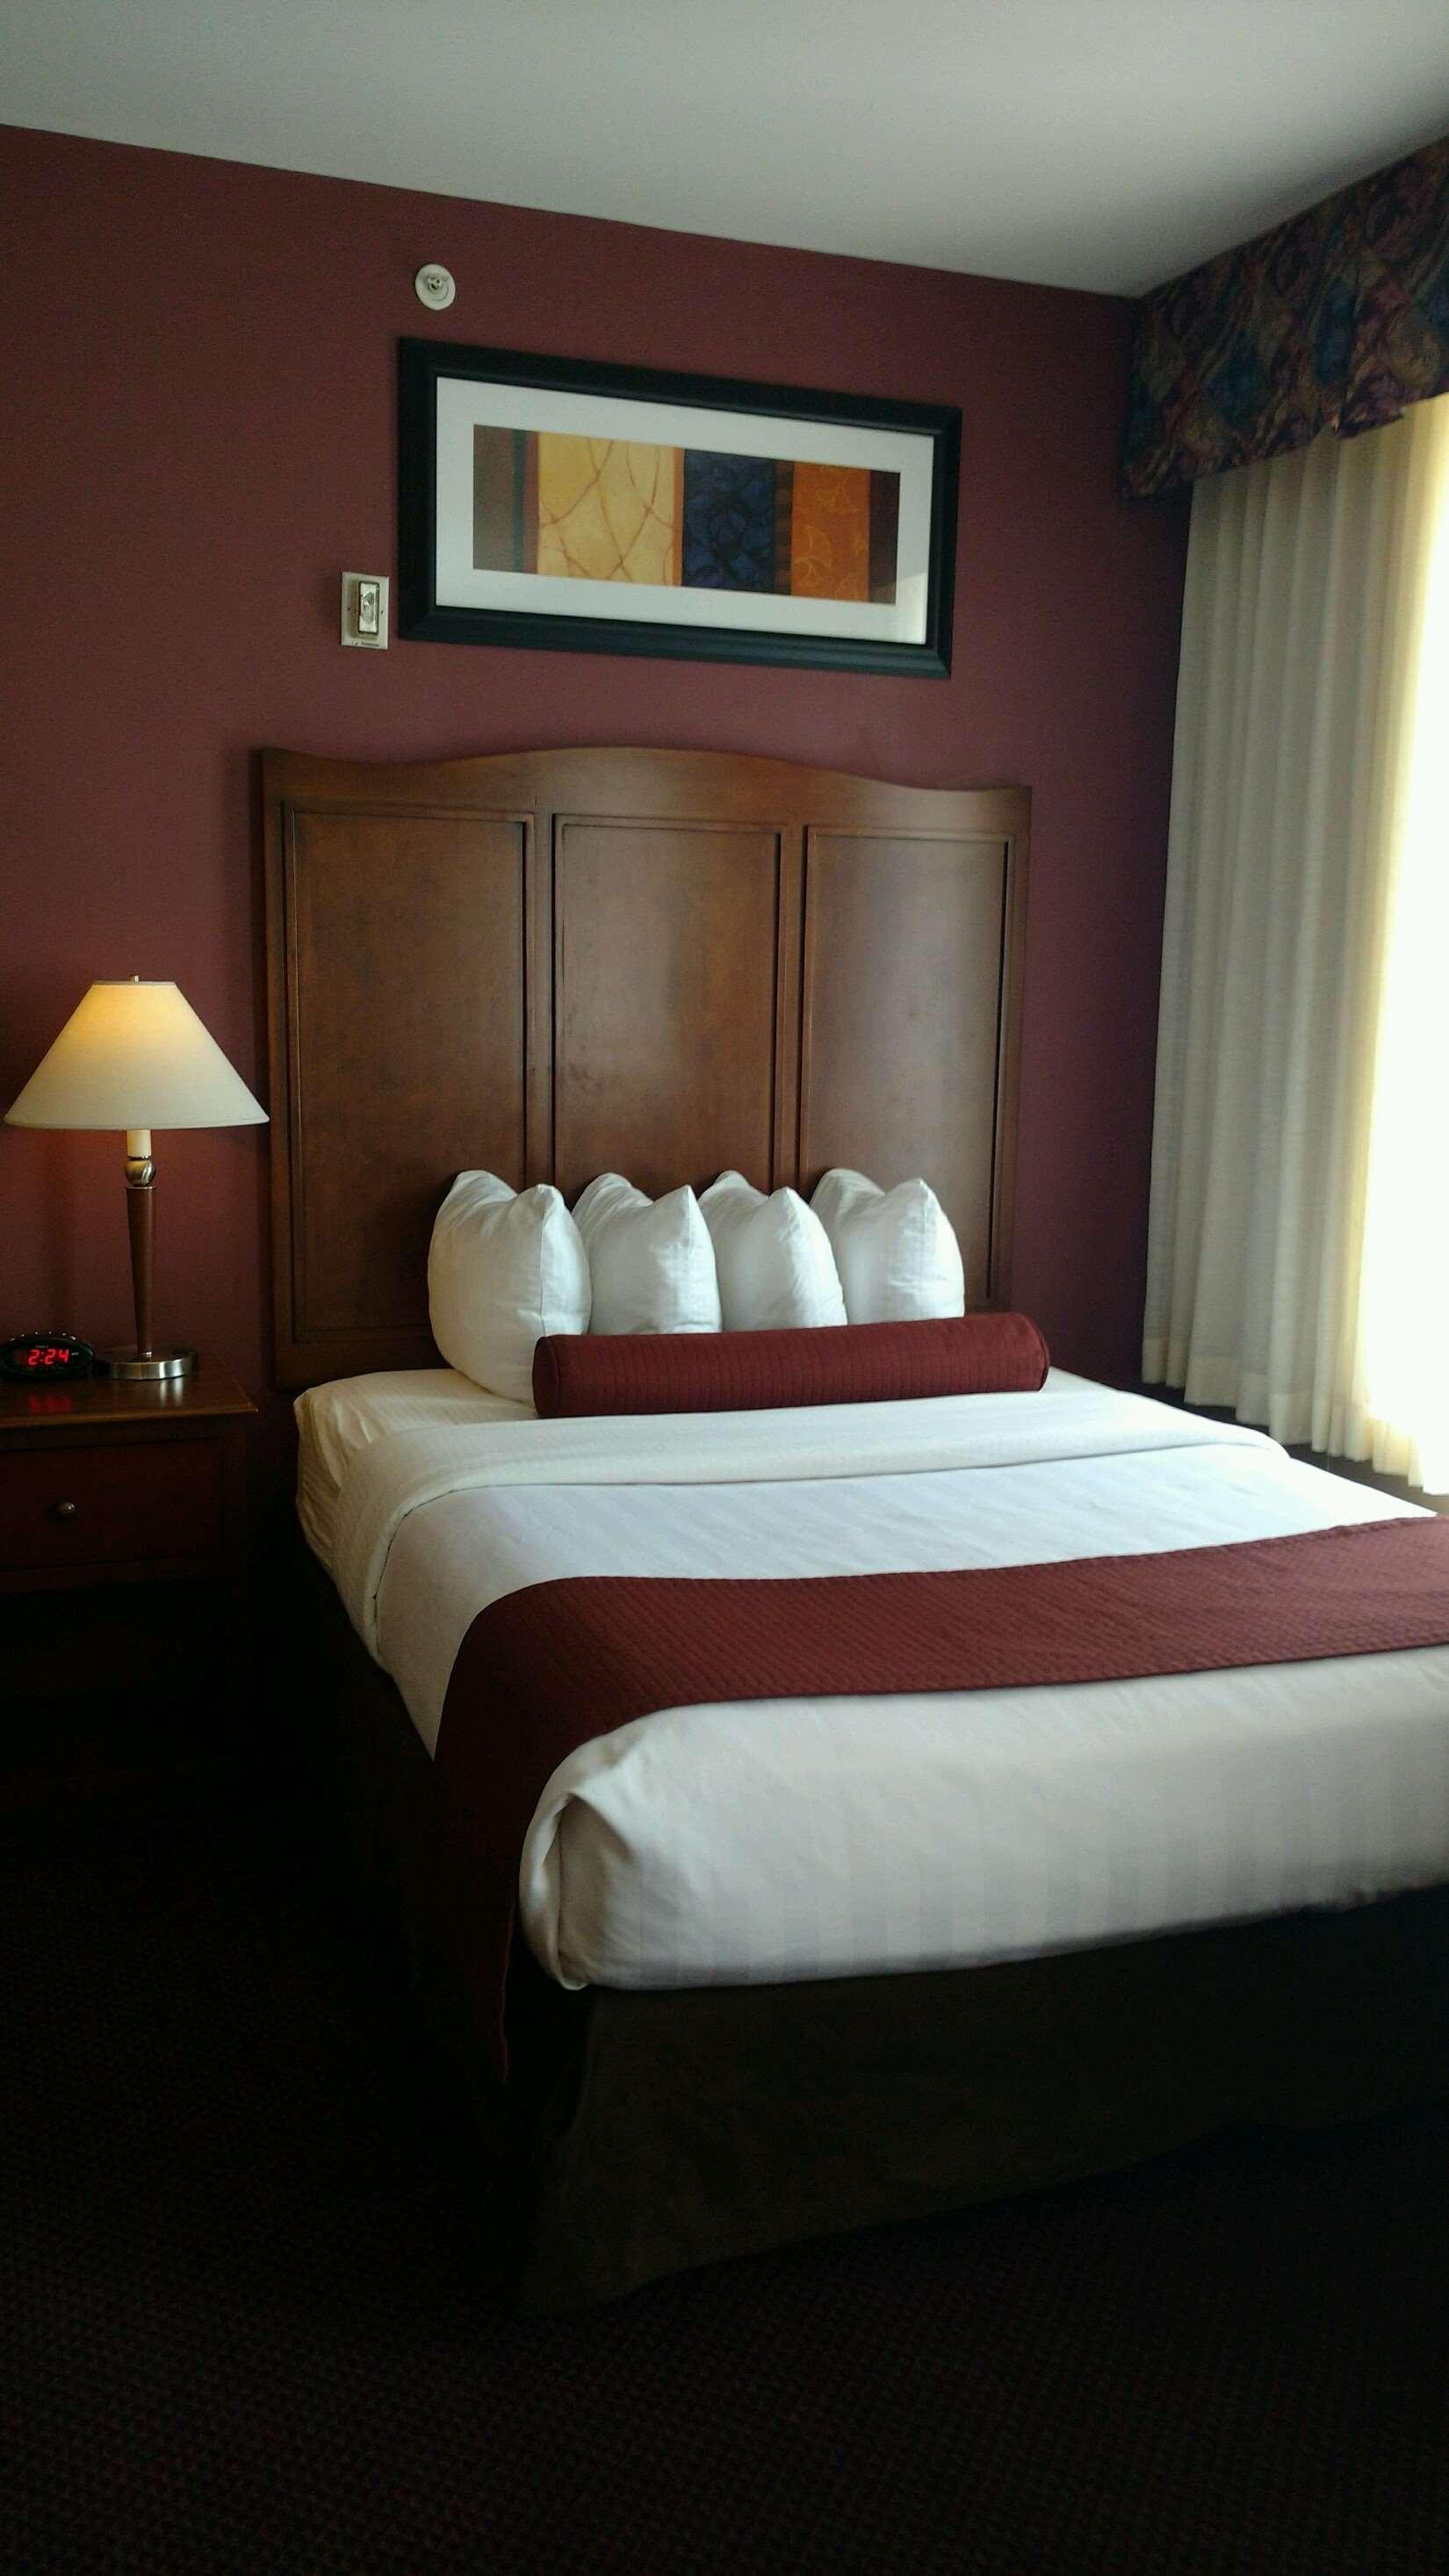 Best Western Plus Hannaford Inn & Suites image 49